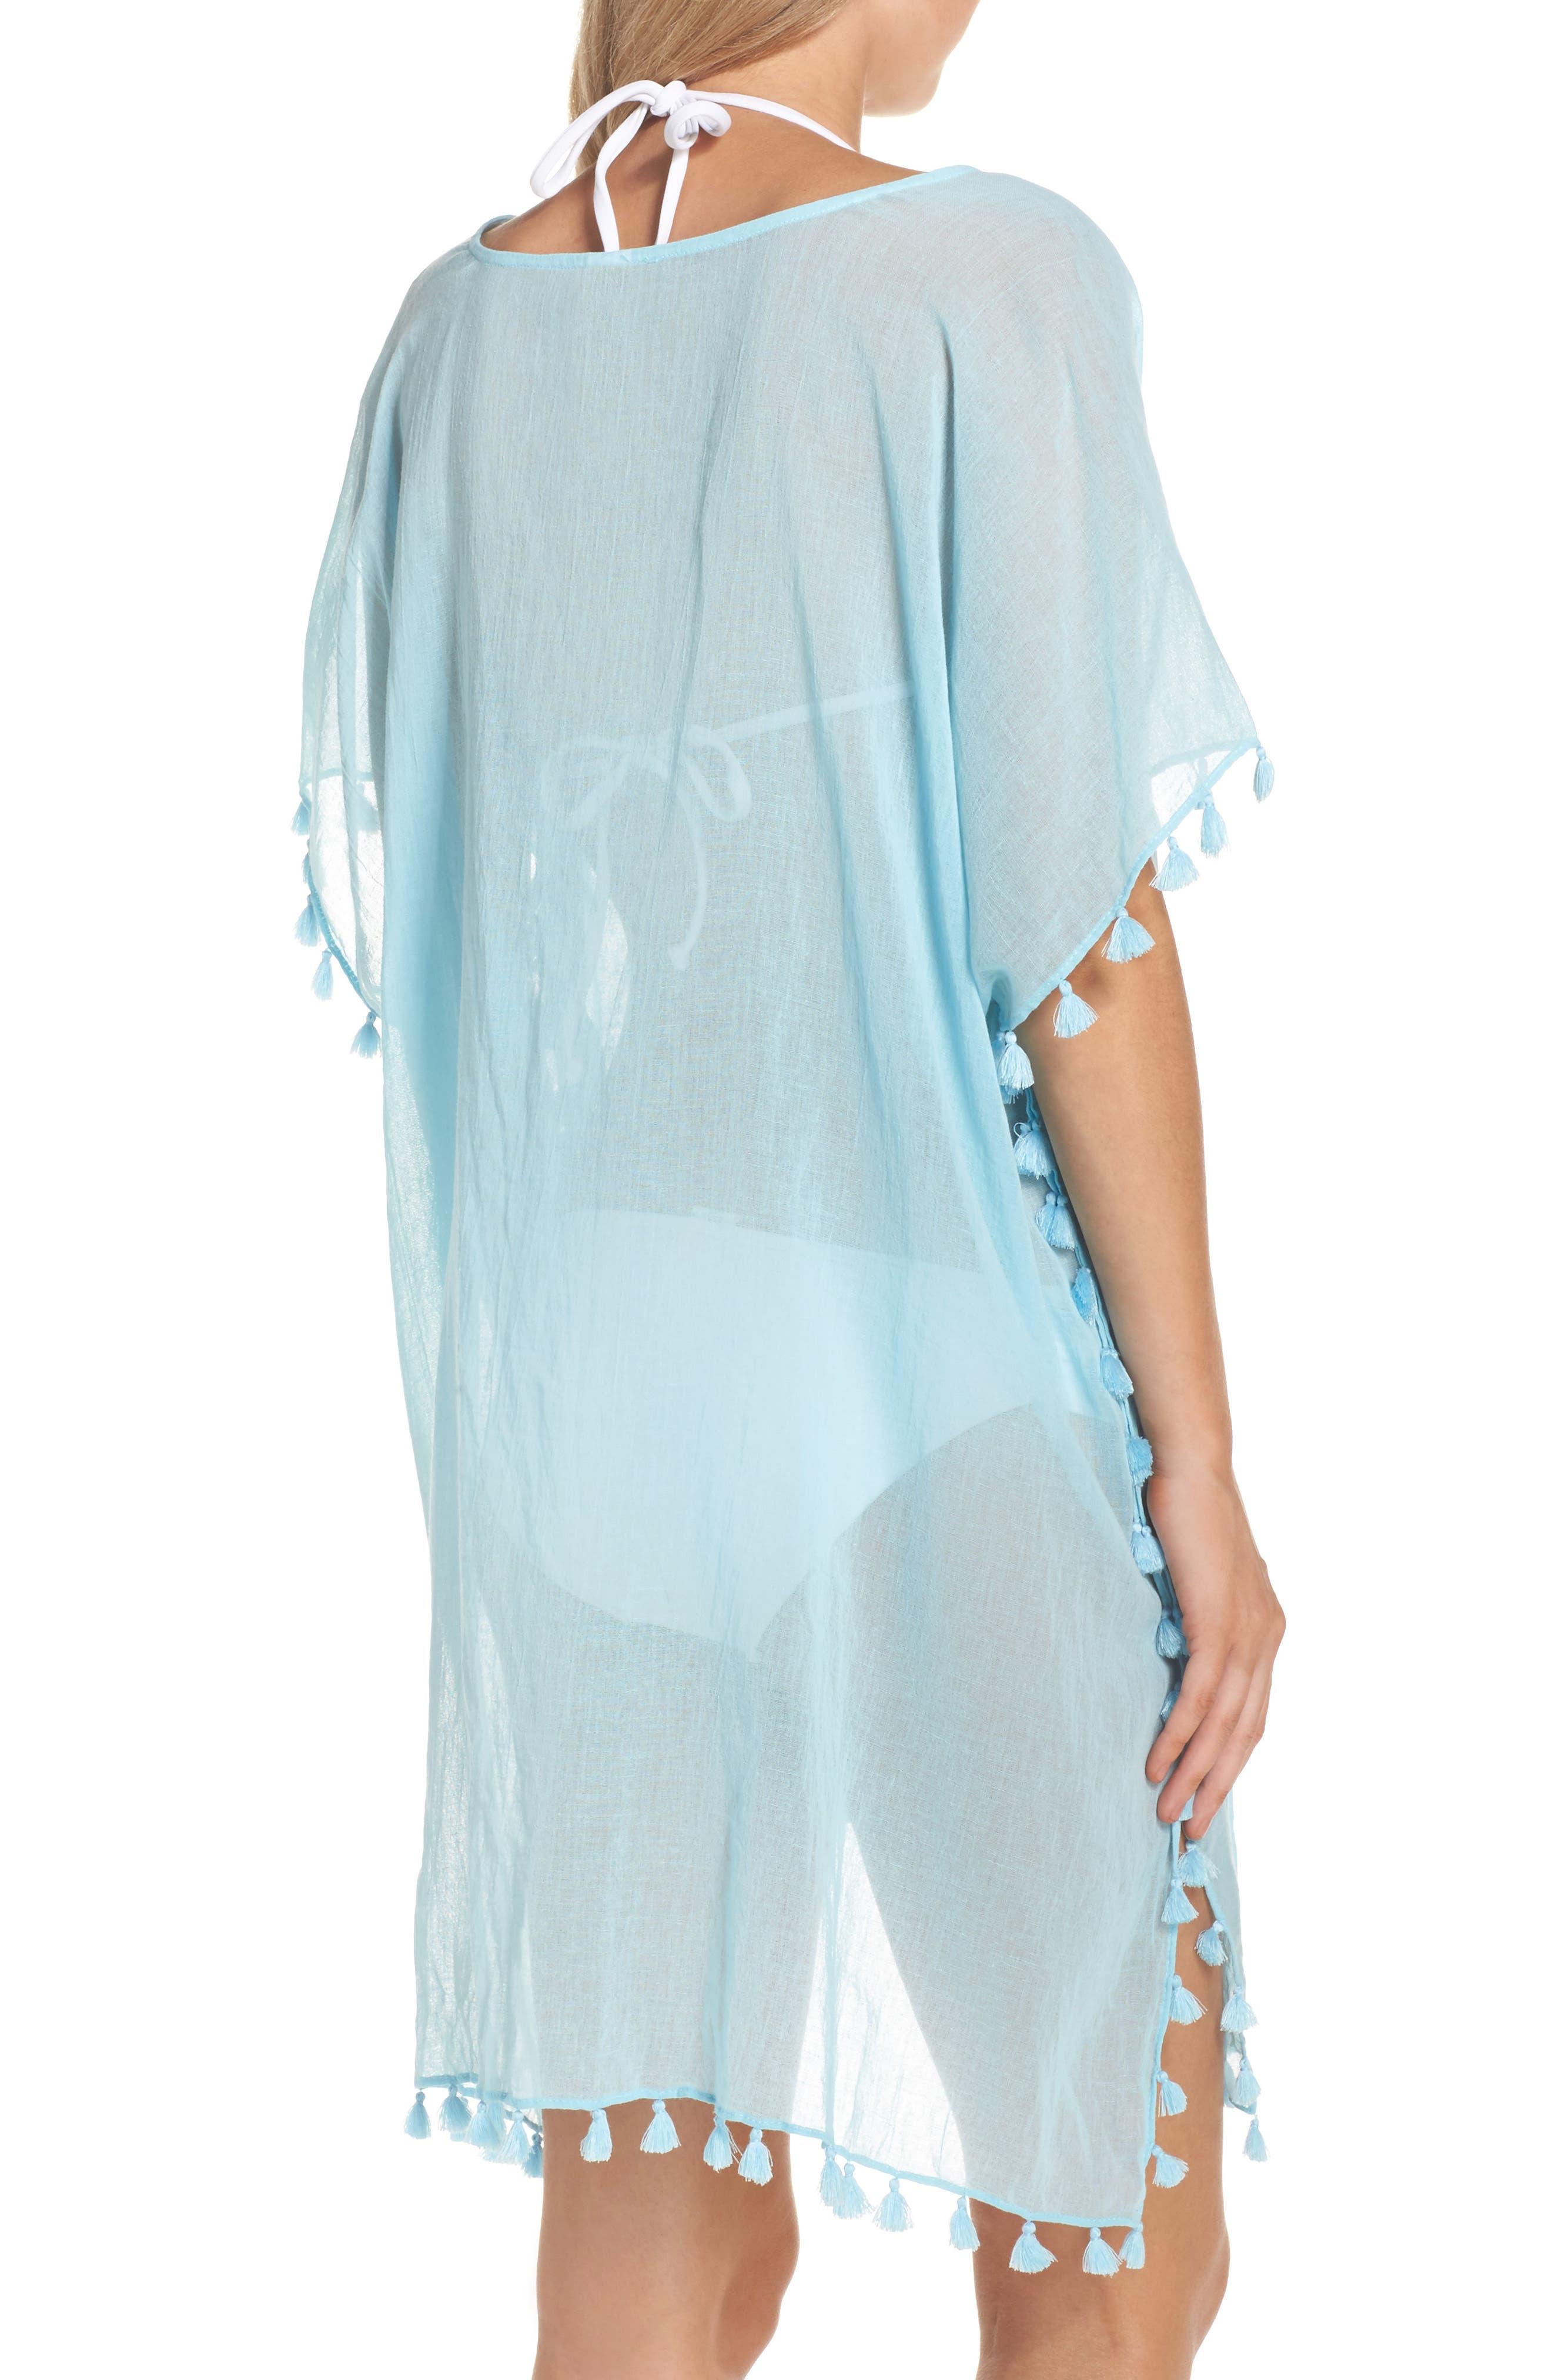 Alternate Image 2  - Seafolly 'Amnesia' Cotton Gauze Cover-Up Caftan